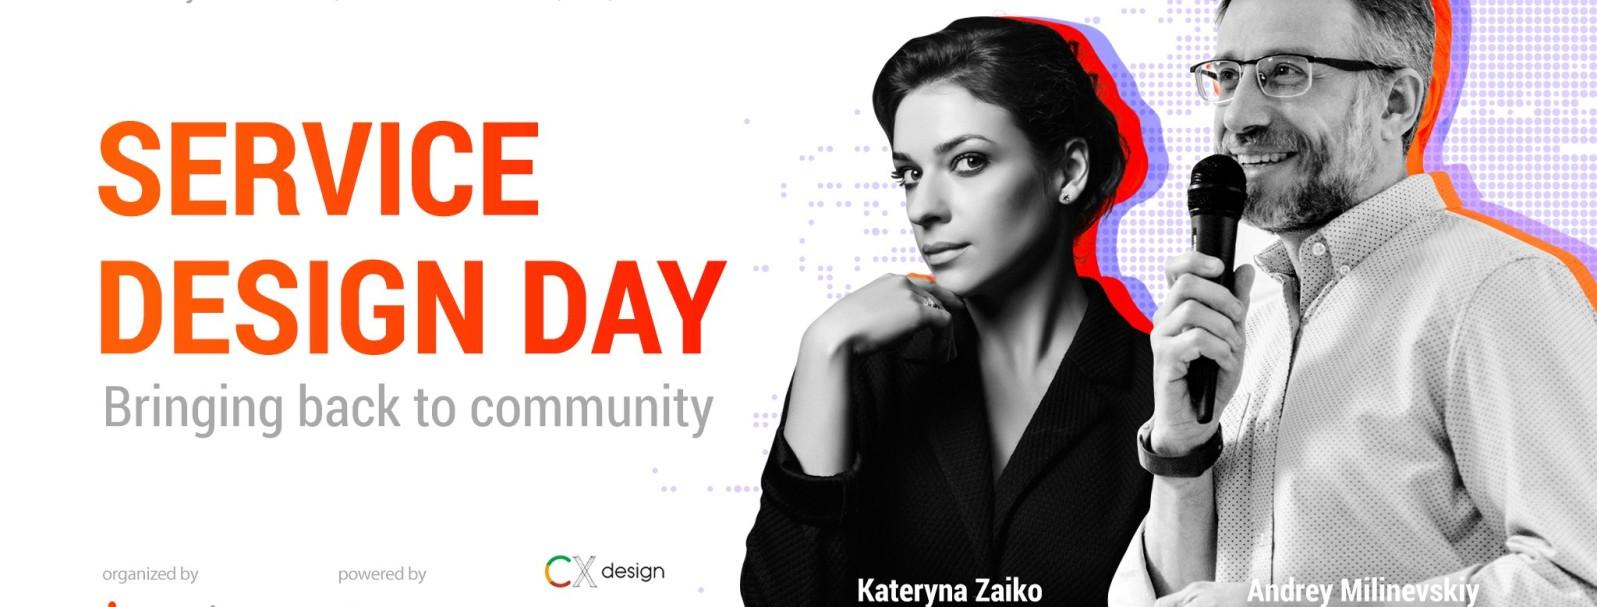 Service Design Day - Bringing back to community